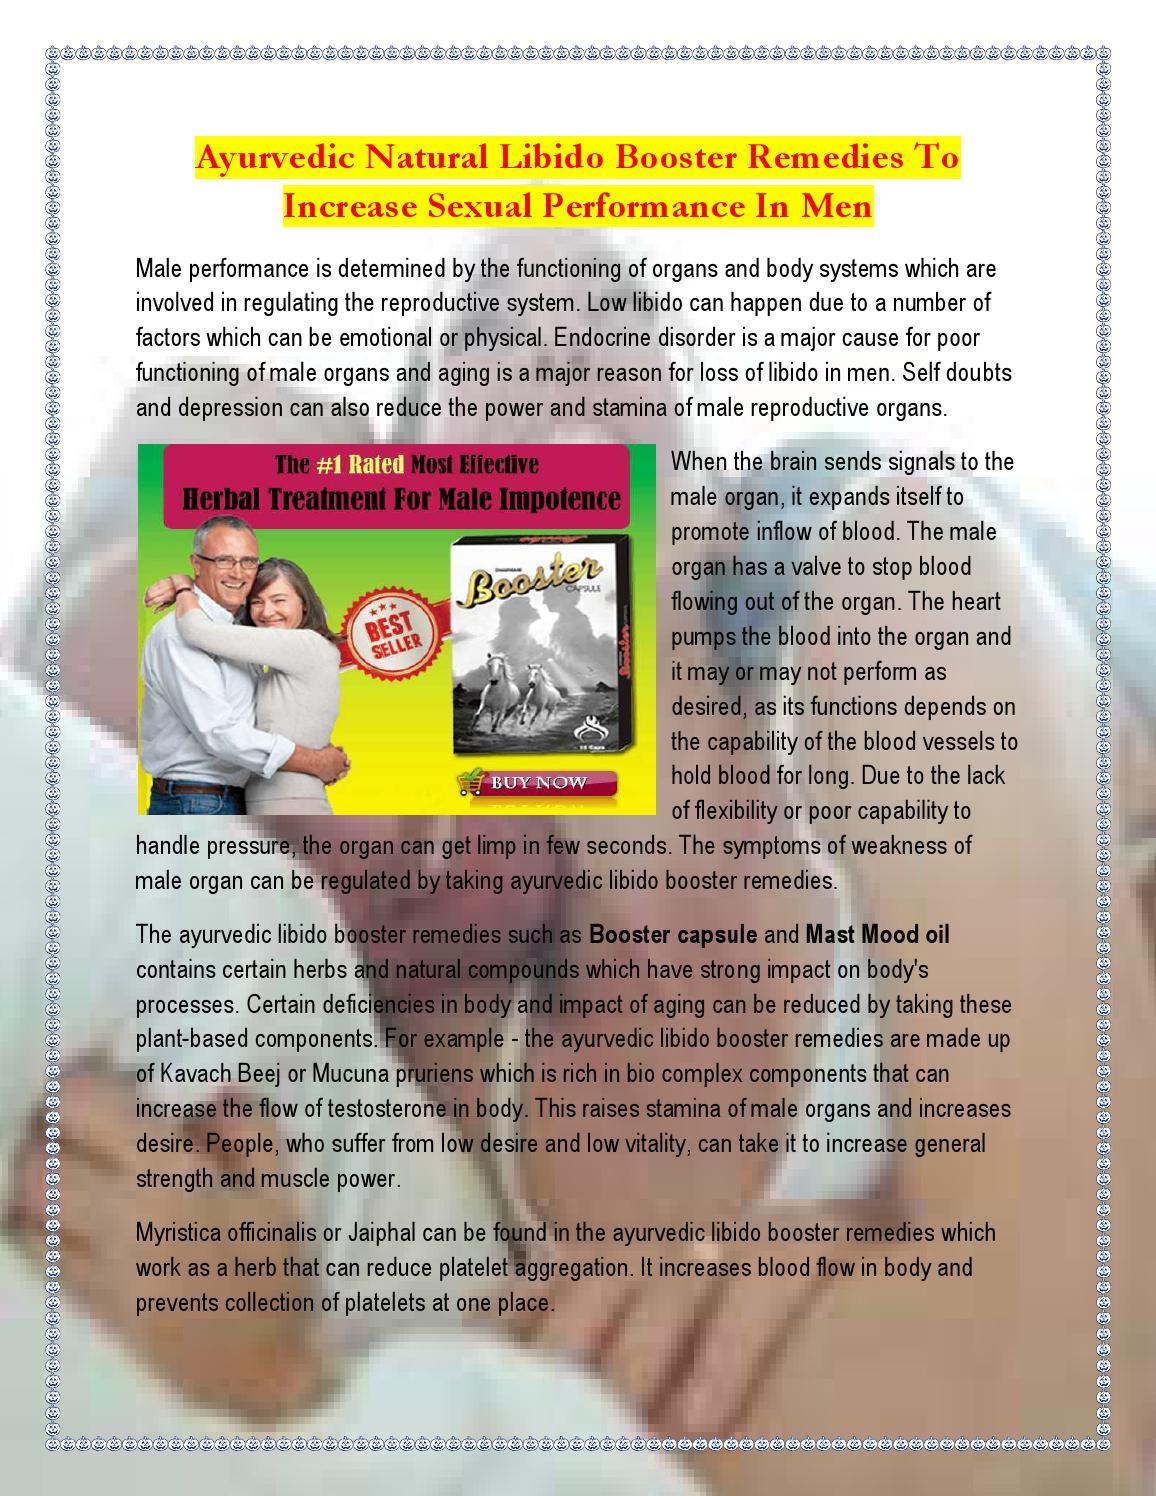 Ayurvedic Natural Libido Booster Remedies To Increase -3105